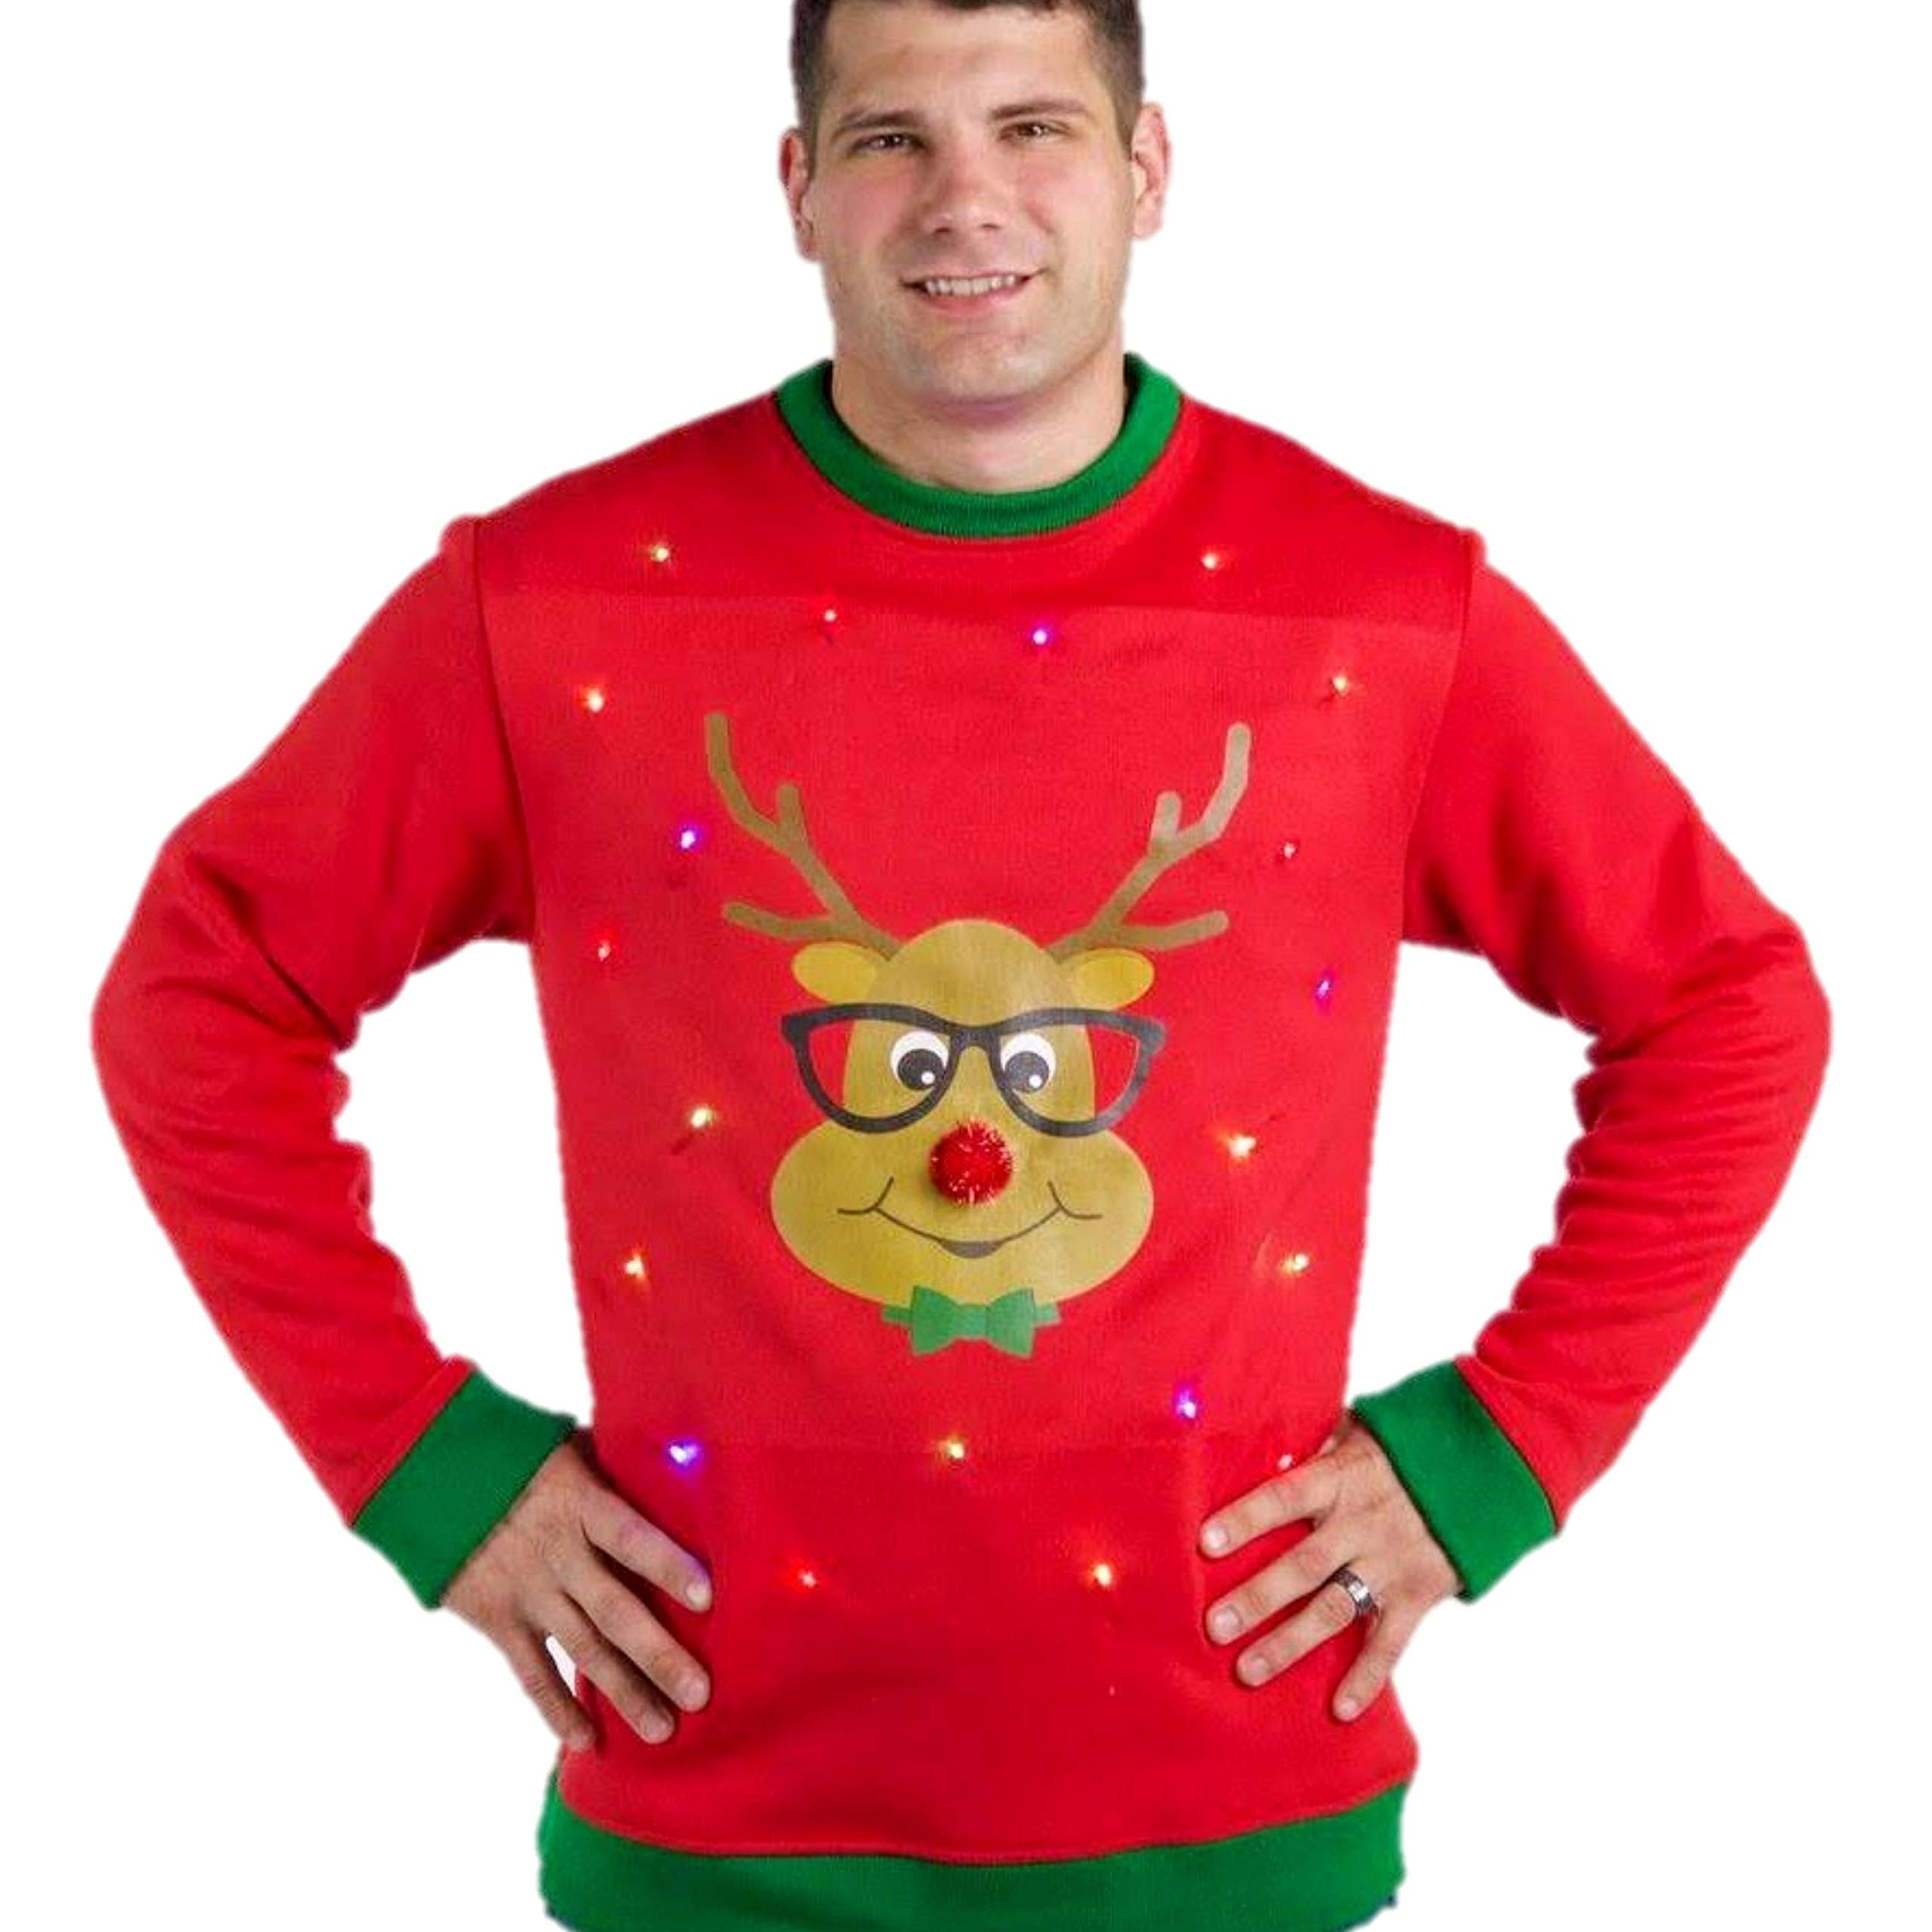 Reindeer Ugly Christmas Sweater Men Light Up, Ugly Sweater with Lights, Ugly Christmas Sweaters